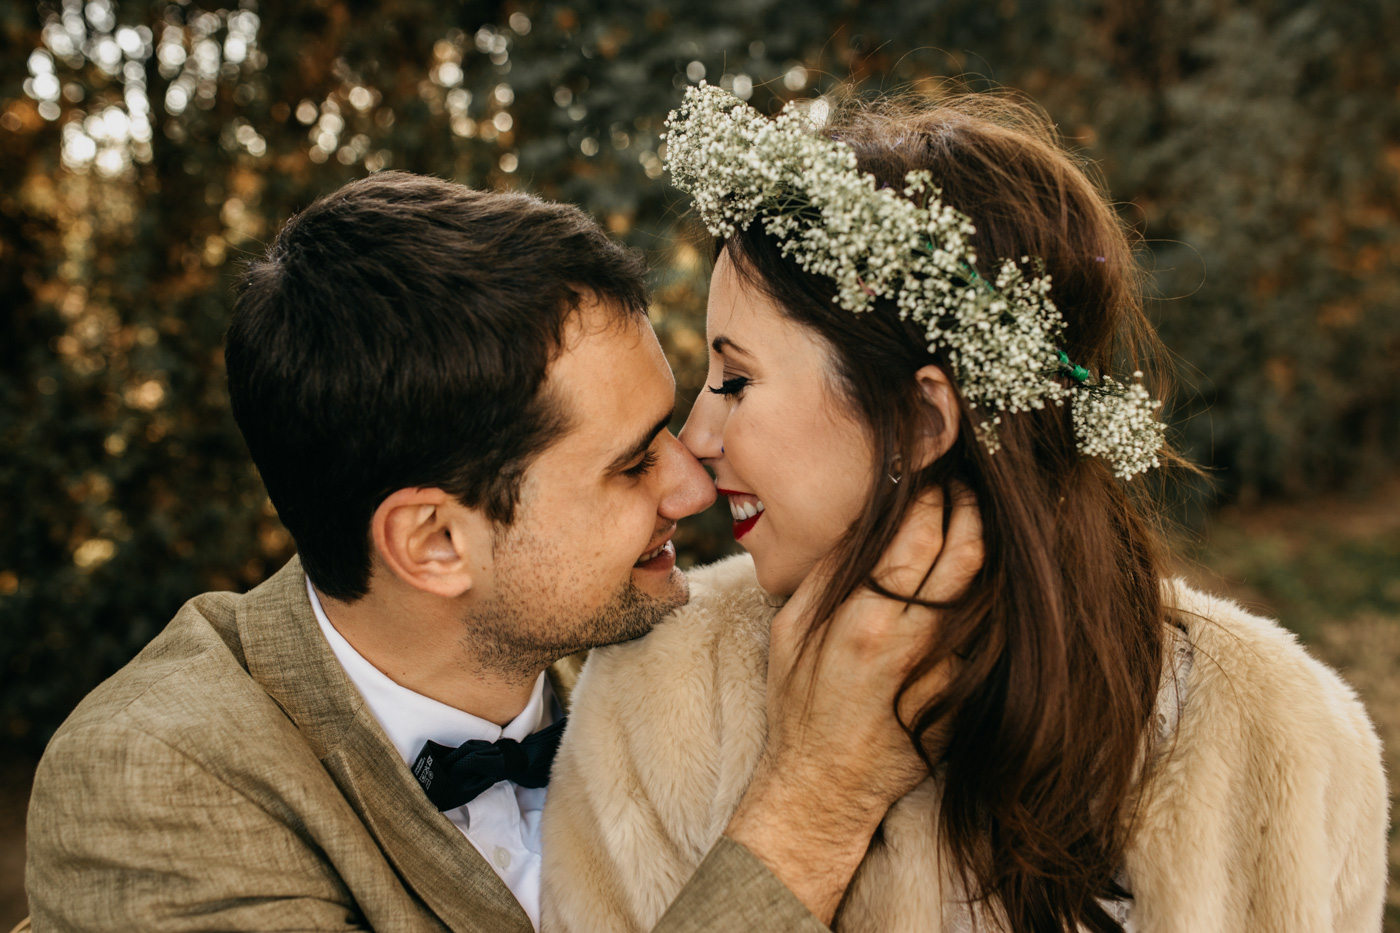 Velvet-Hush-fotografos-boda-al-aire-libre-madrid-069